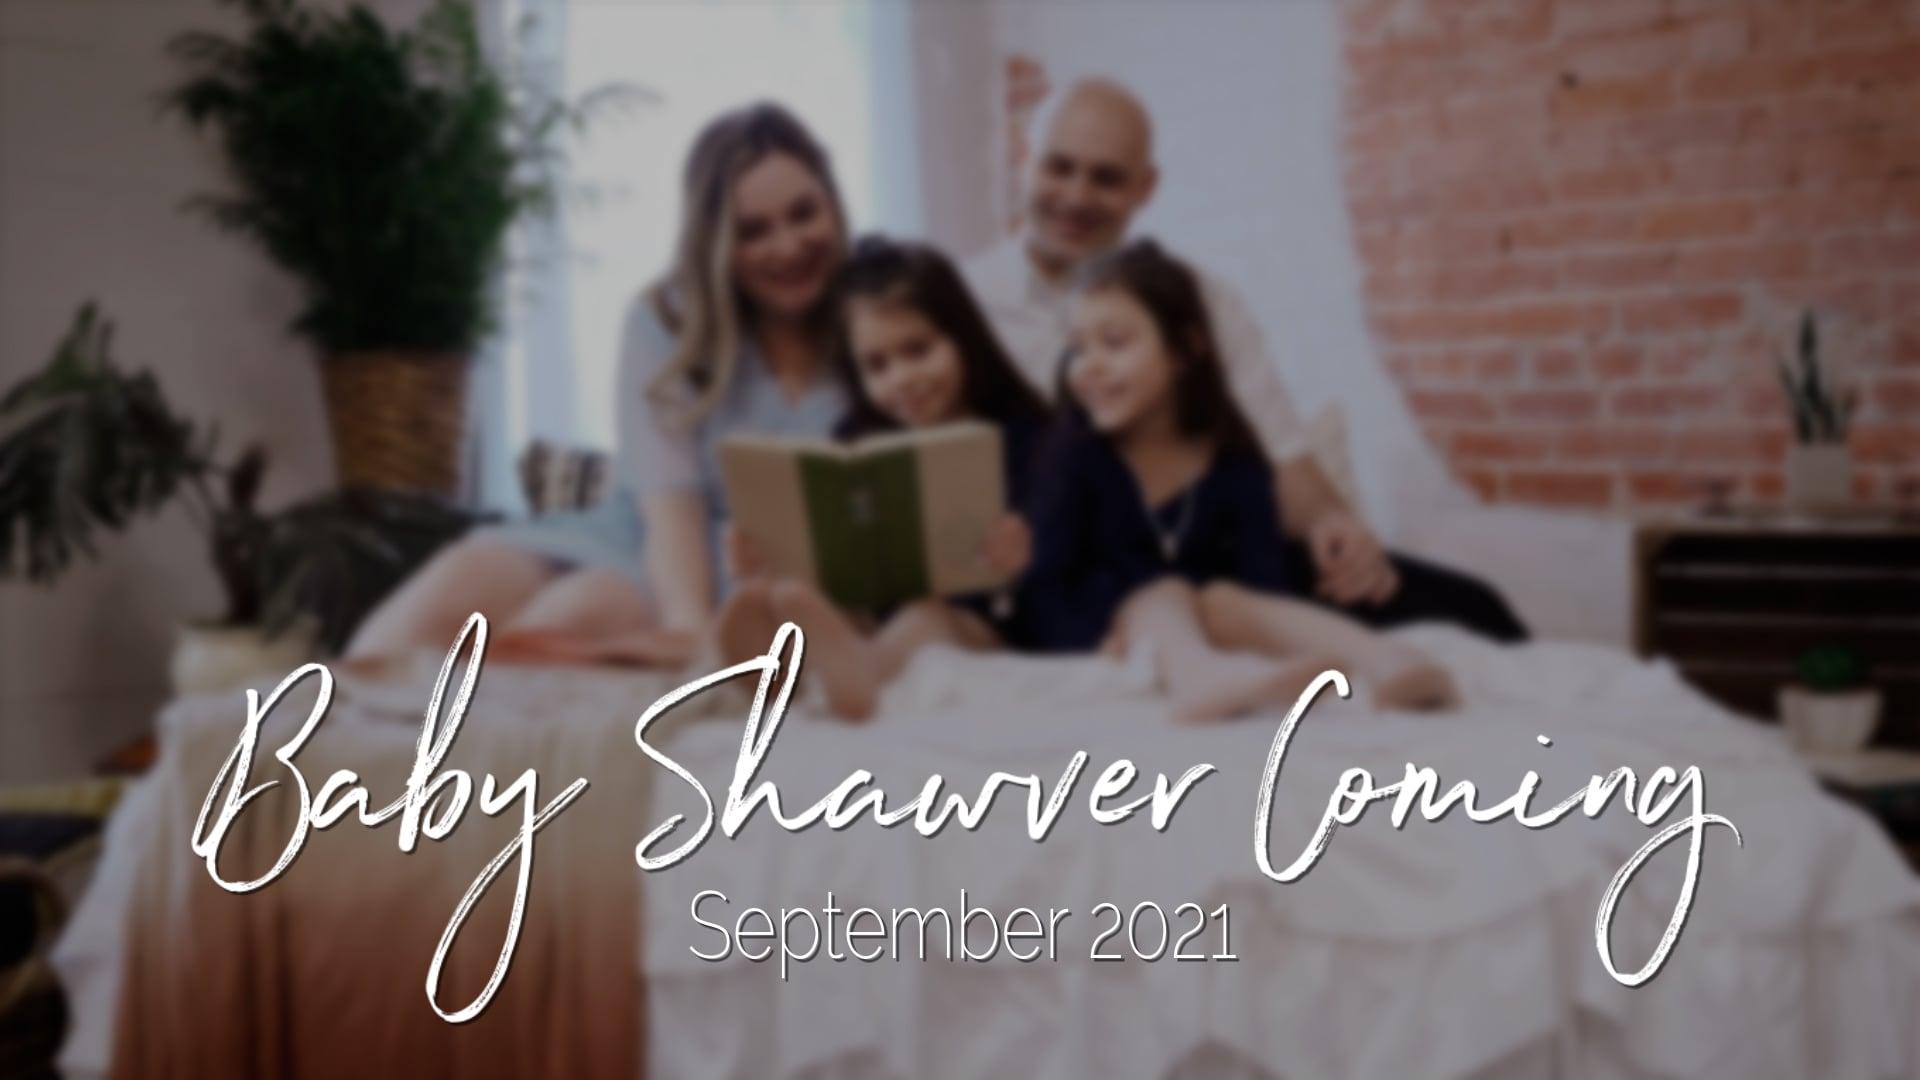 Shawver Pregnancy Announcement